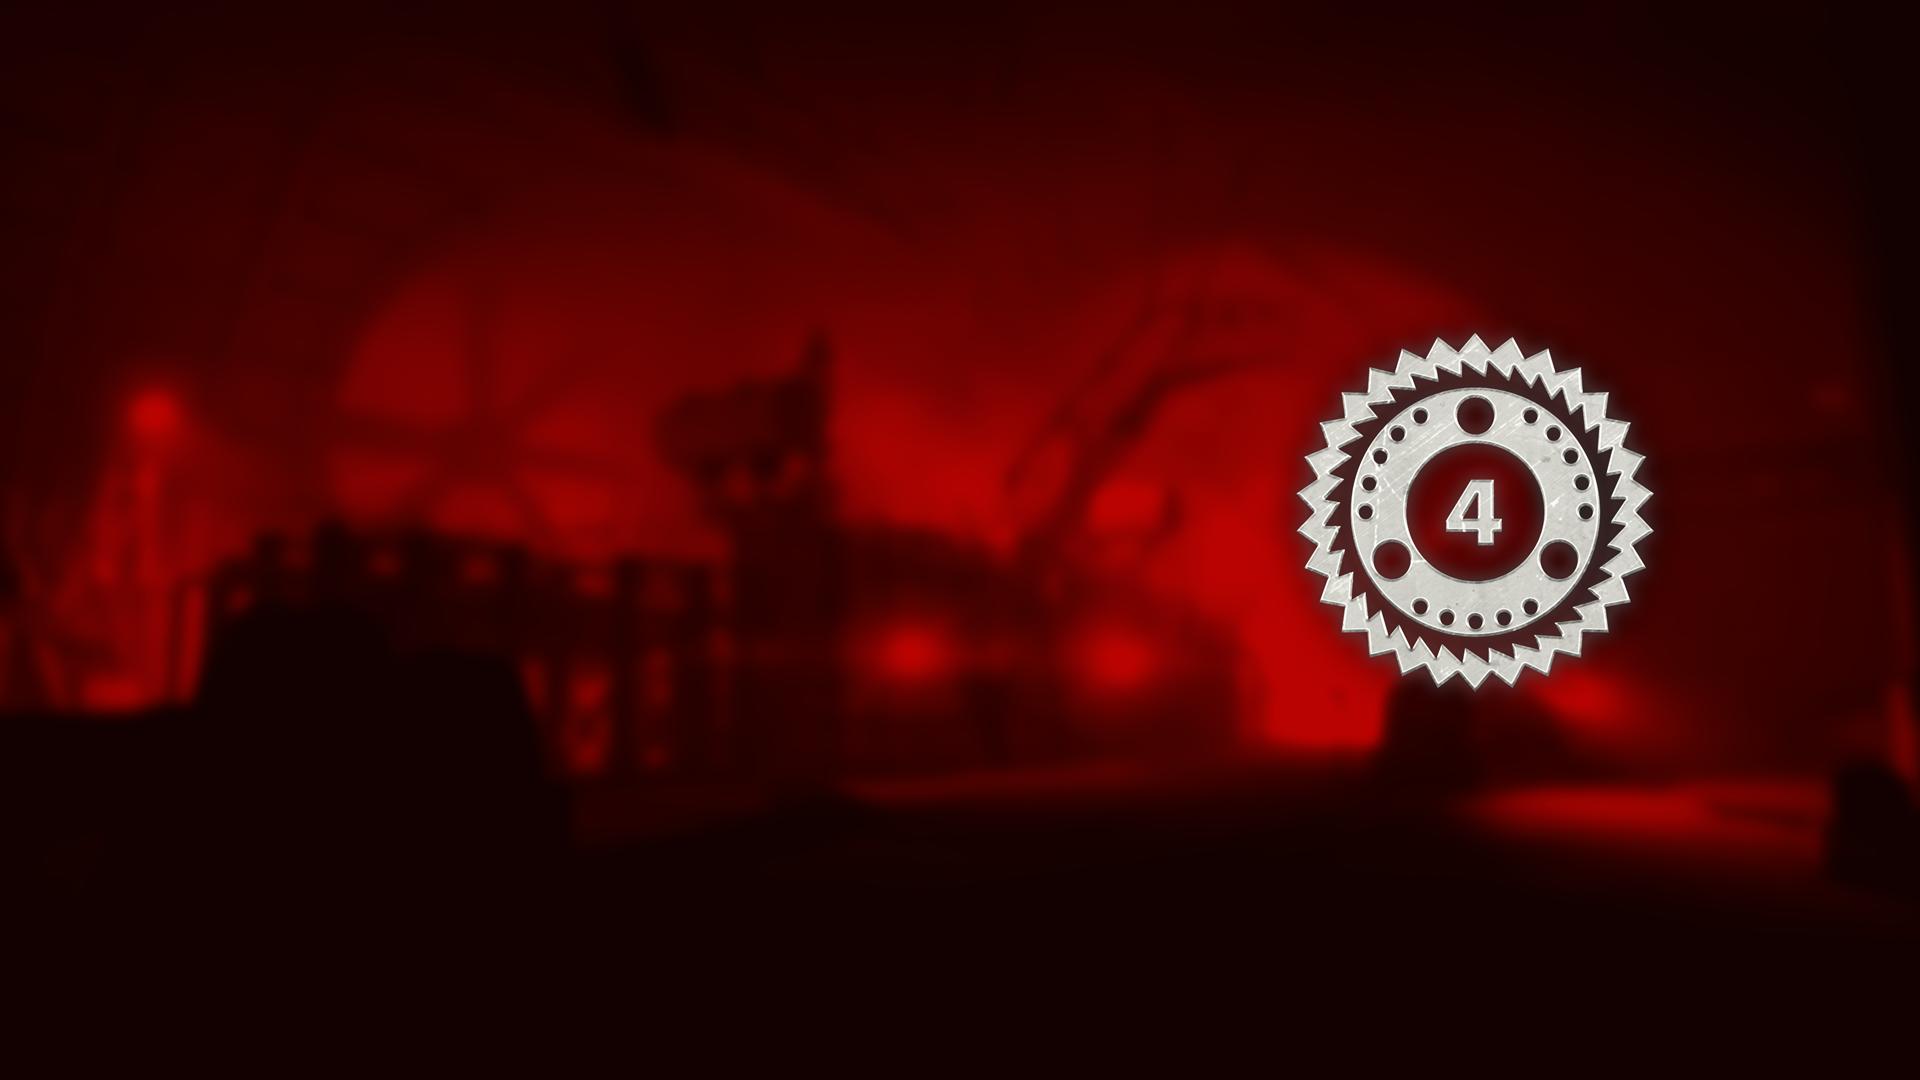 Icon for Secrets revealed IV